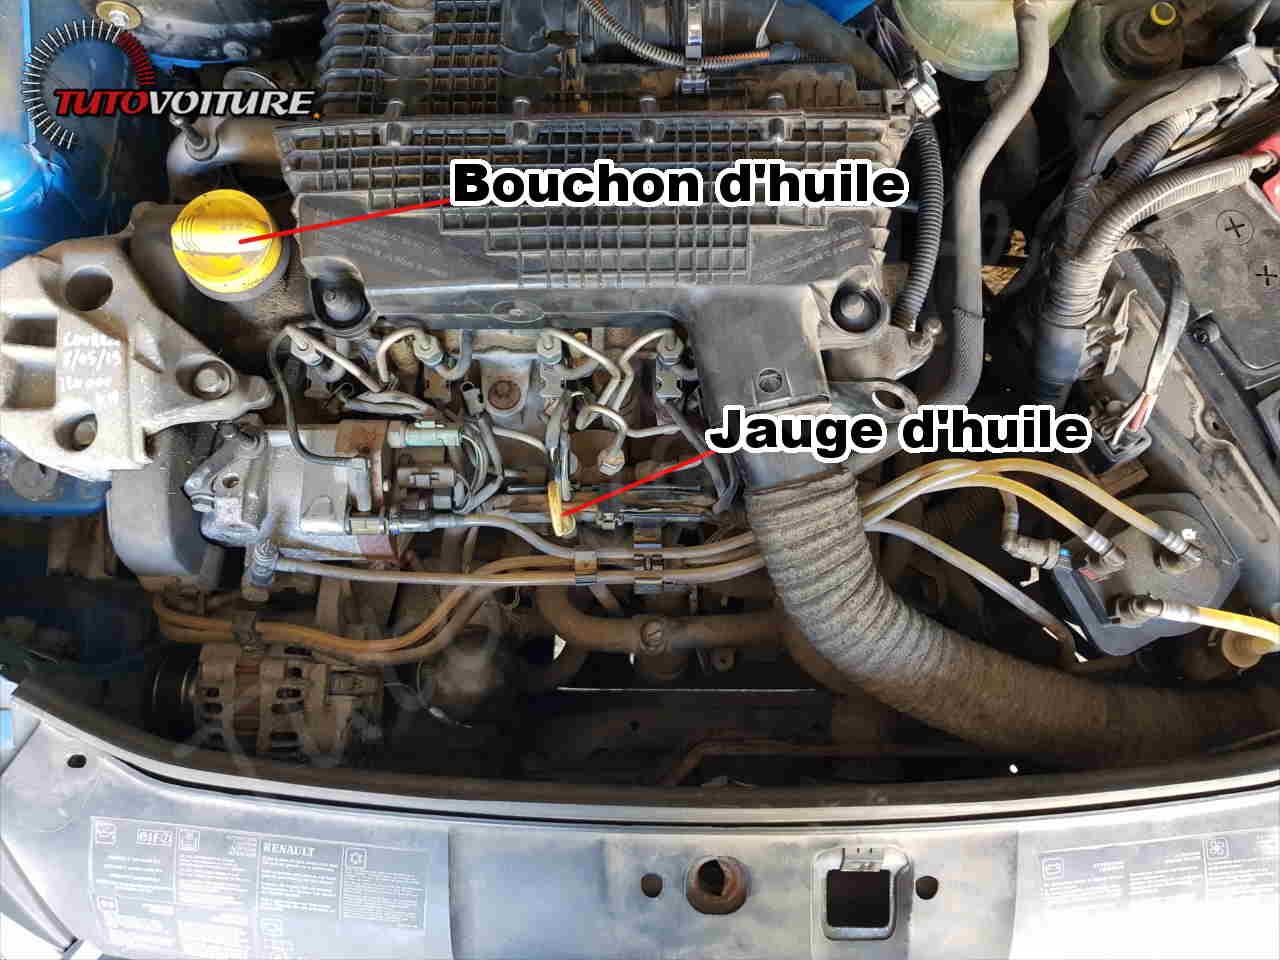 bouchon et jauge d'huile - Renault Clio 2